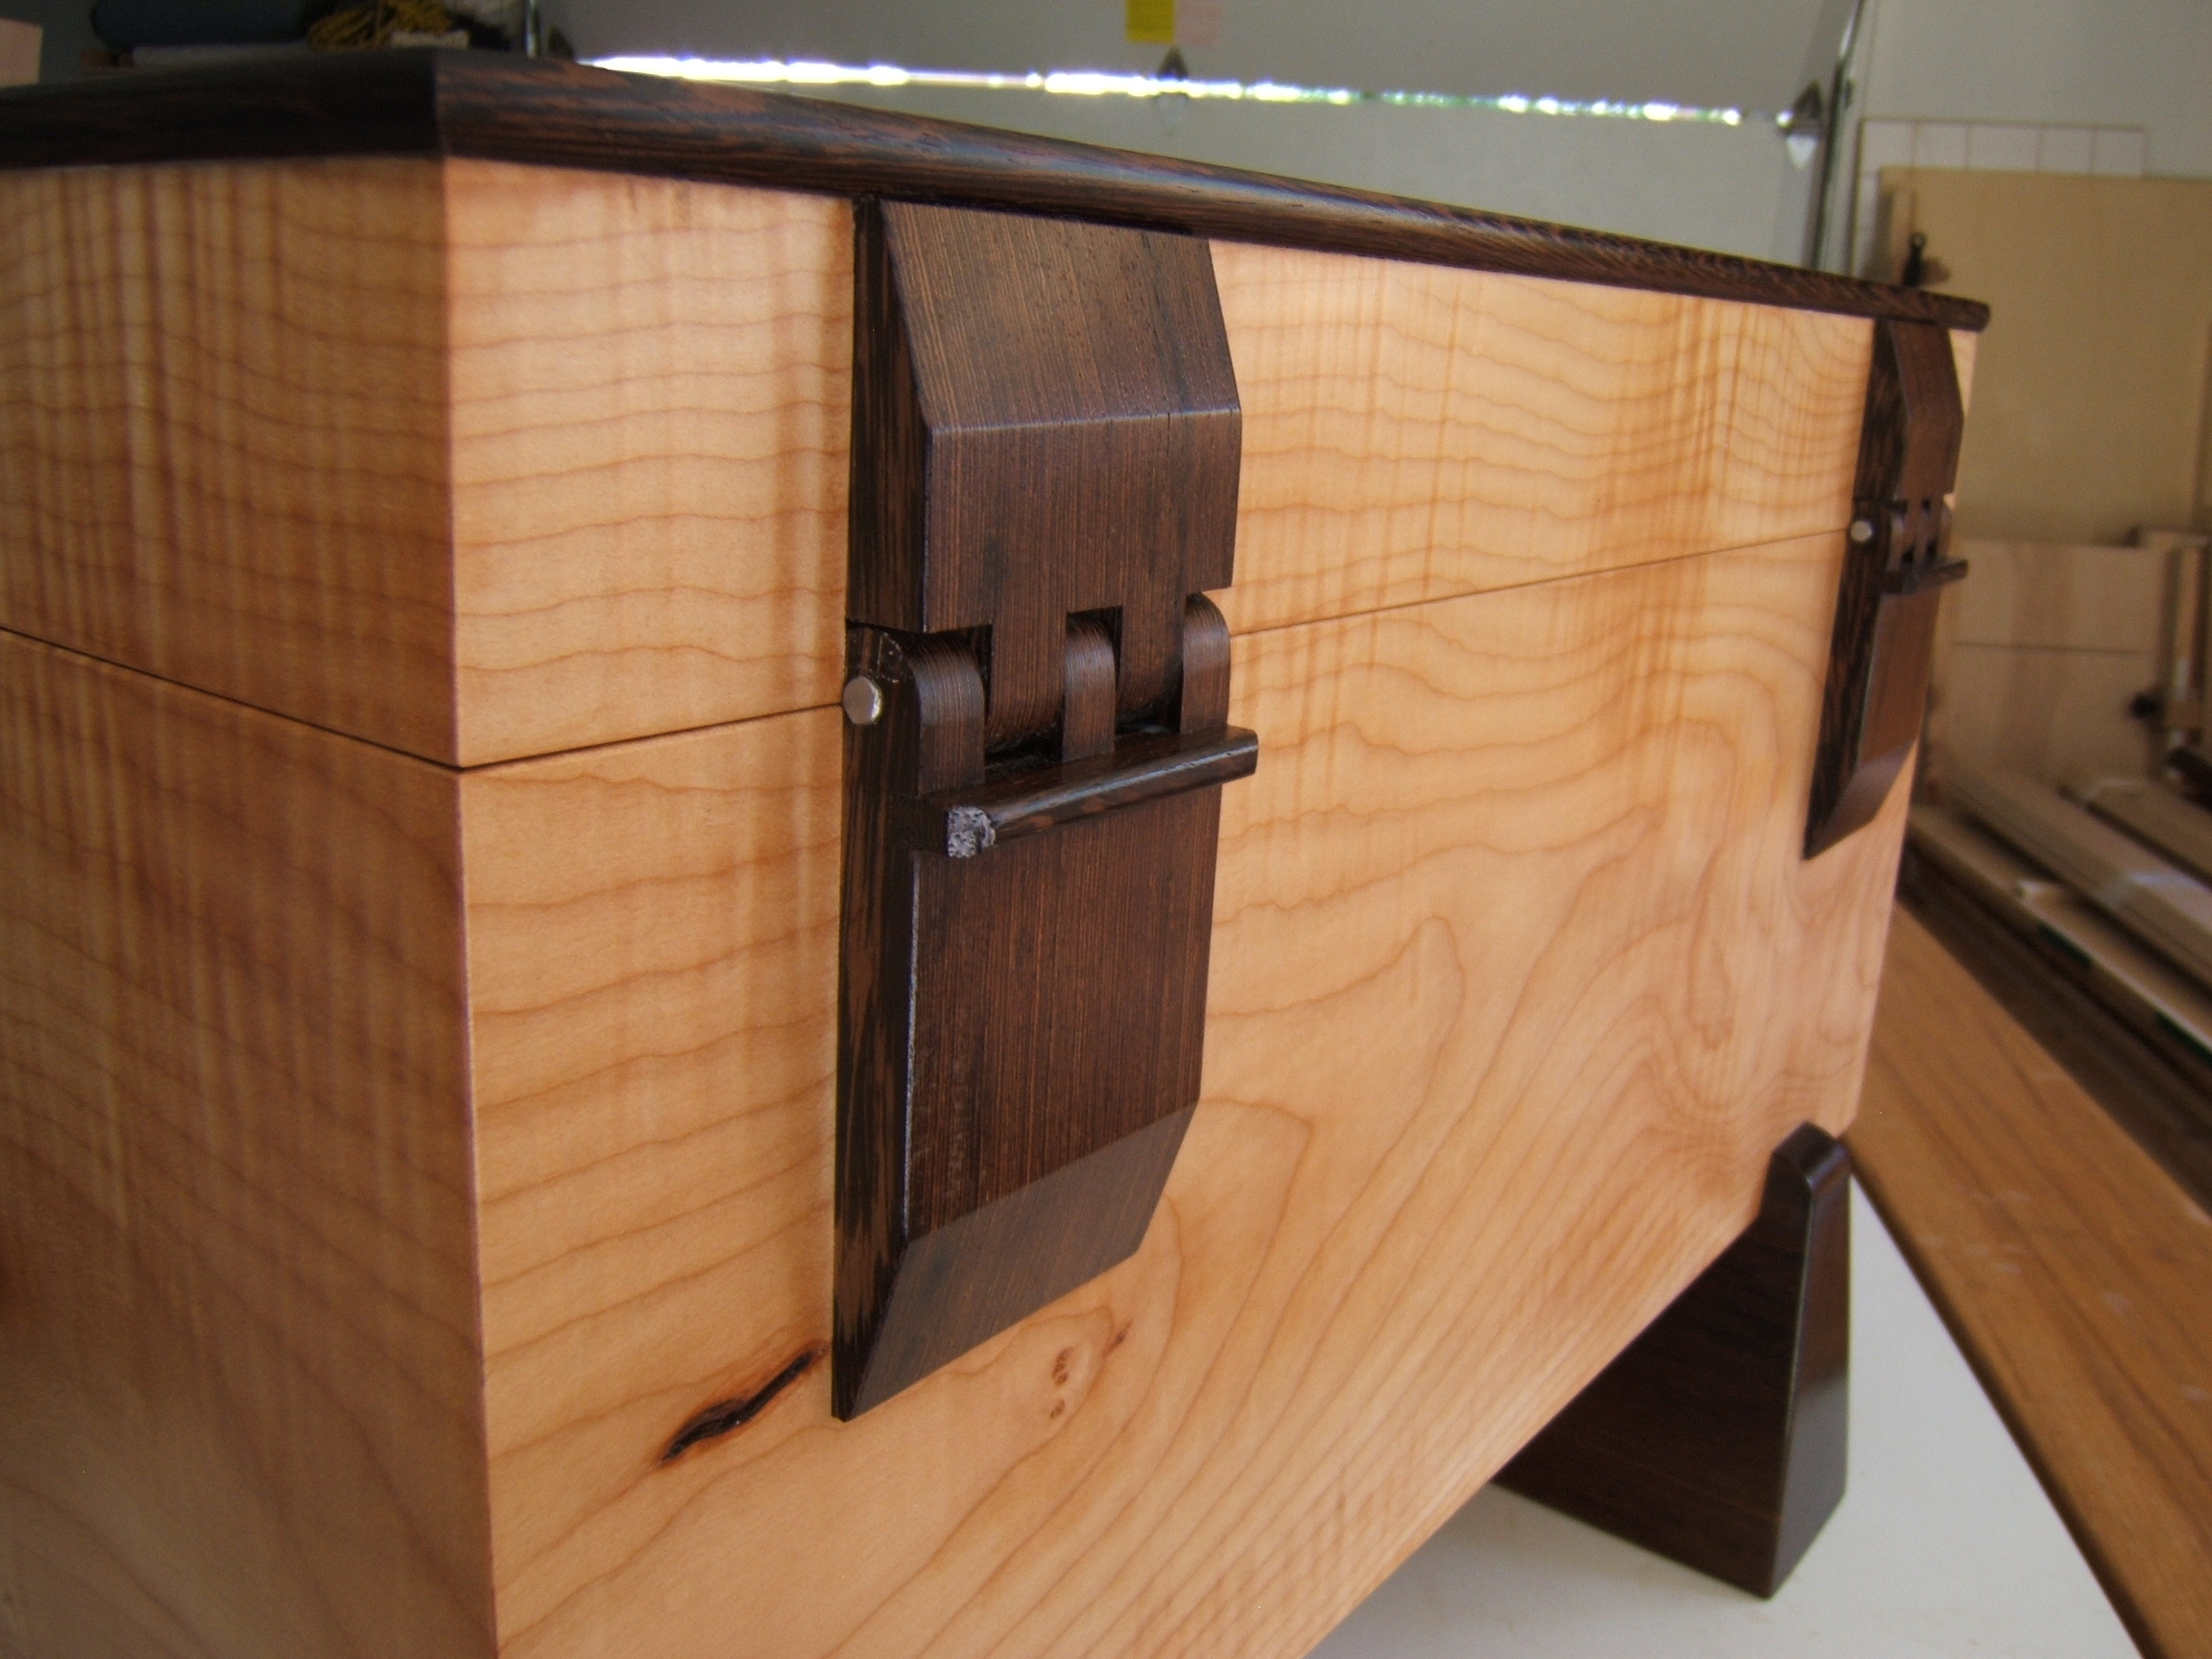 Build Wooden Hinges DIY woodworking serving tray | broken66oty